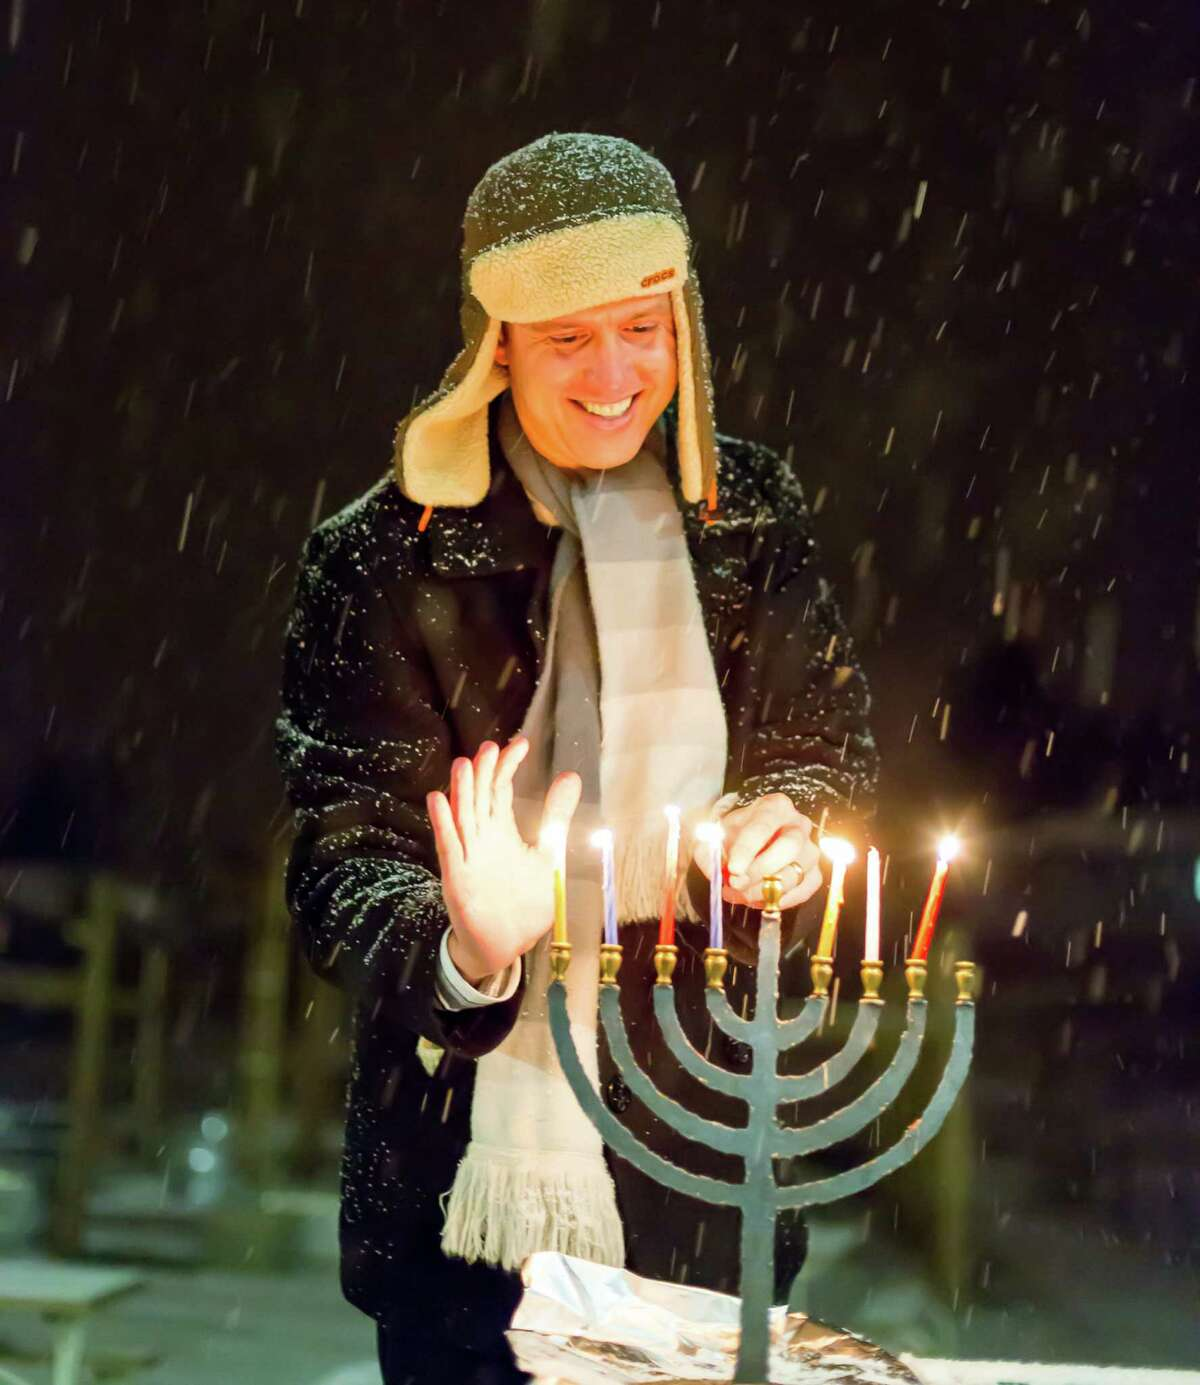 Josh Zapin lights a menorah in the snow with the Adventure Rabbi program in Boulder, Colo.